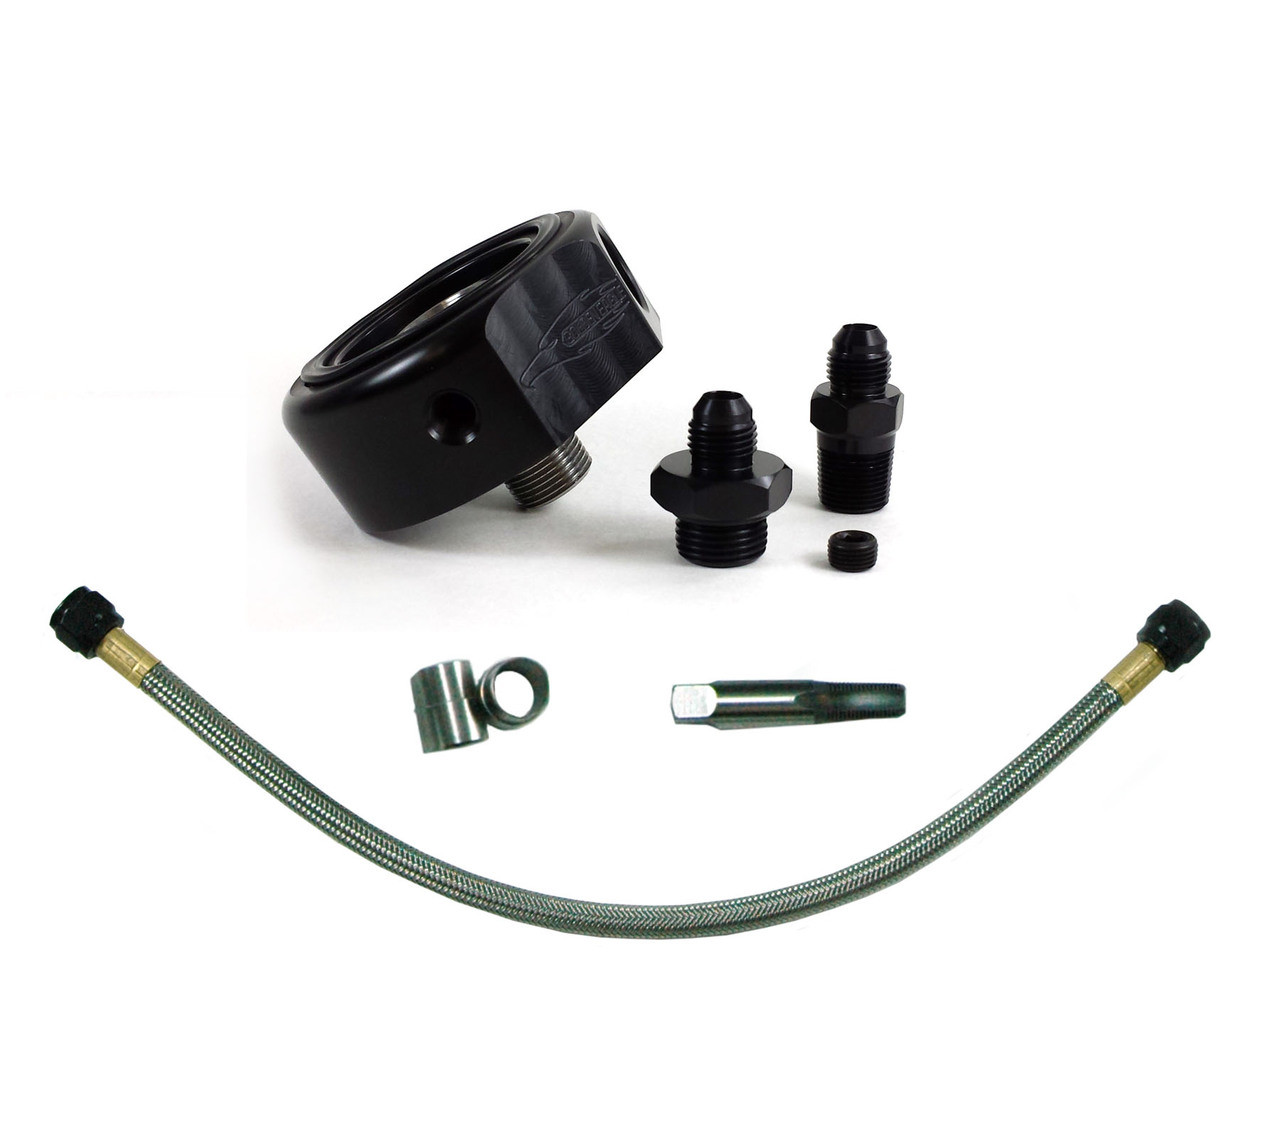 Golden Eagle - Honda/Acura VTEC Conversion Kit (No Gasket)